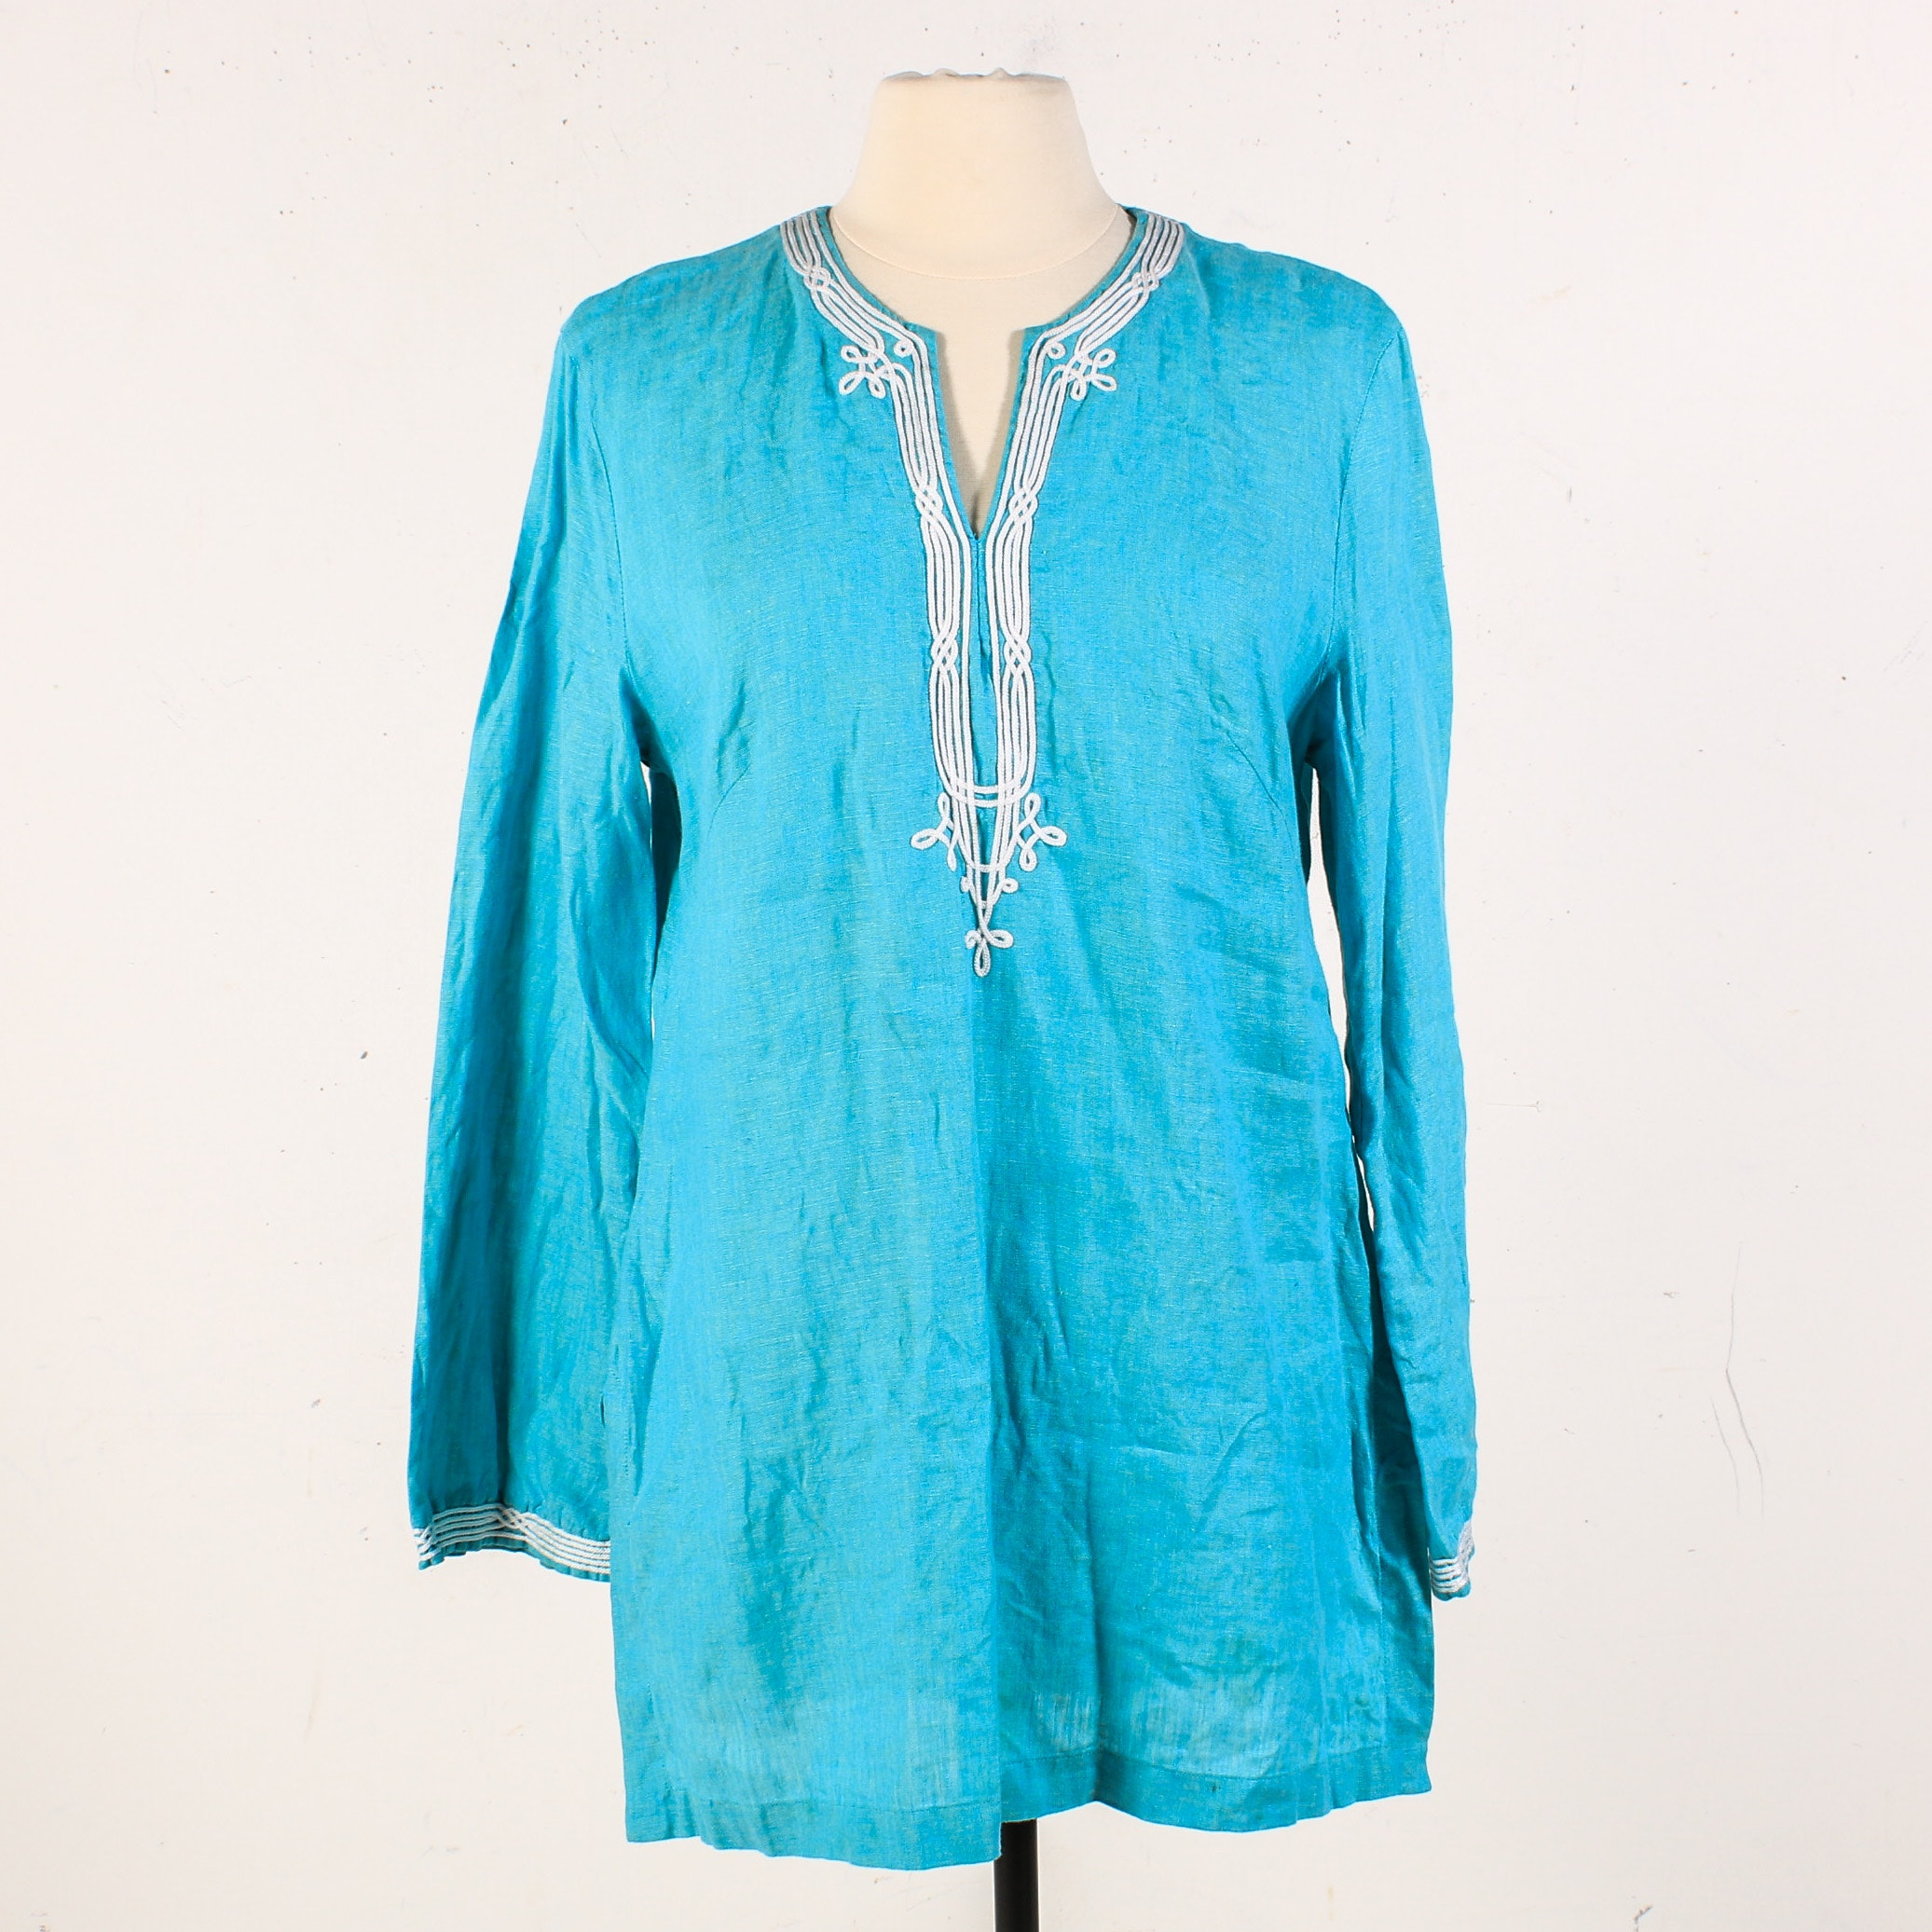 Escada Embellished Blue Linen Tunic Shirt